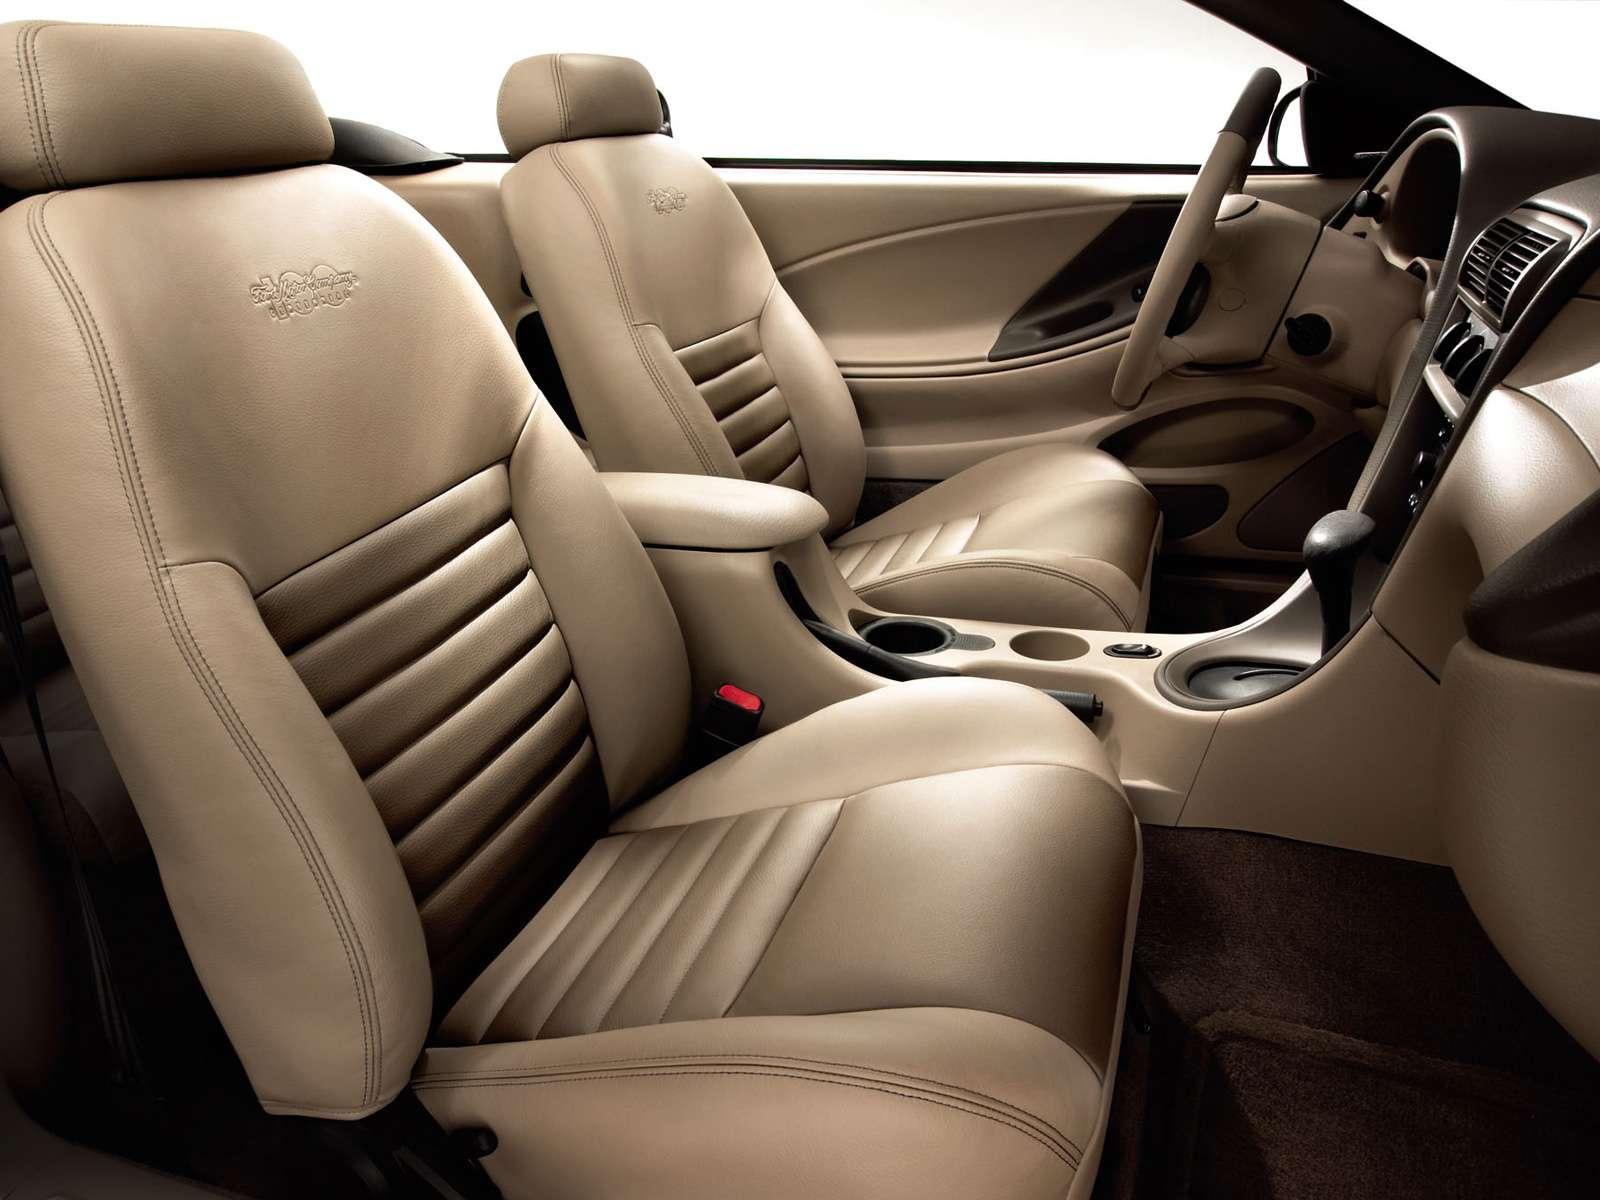 2003 Ford Mustang GT Centennial Edition Interior